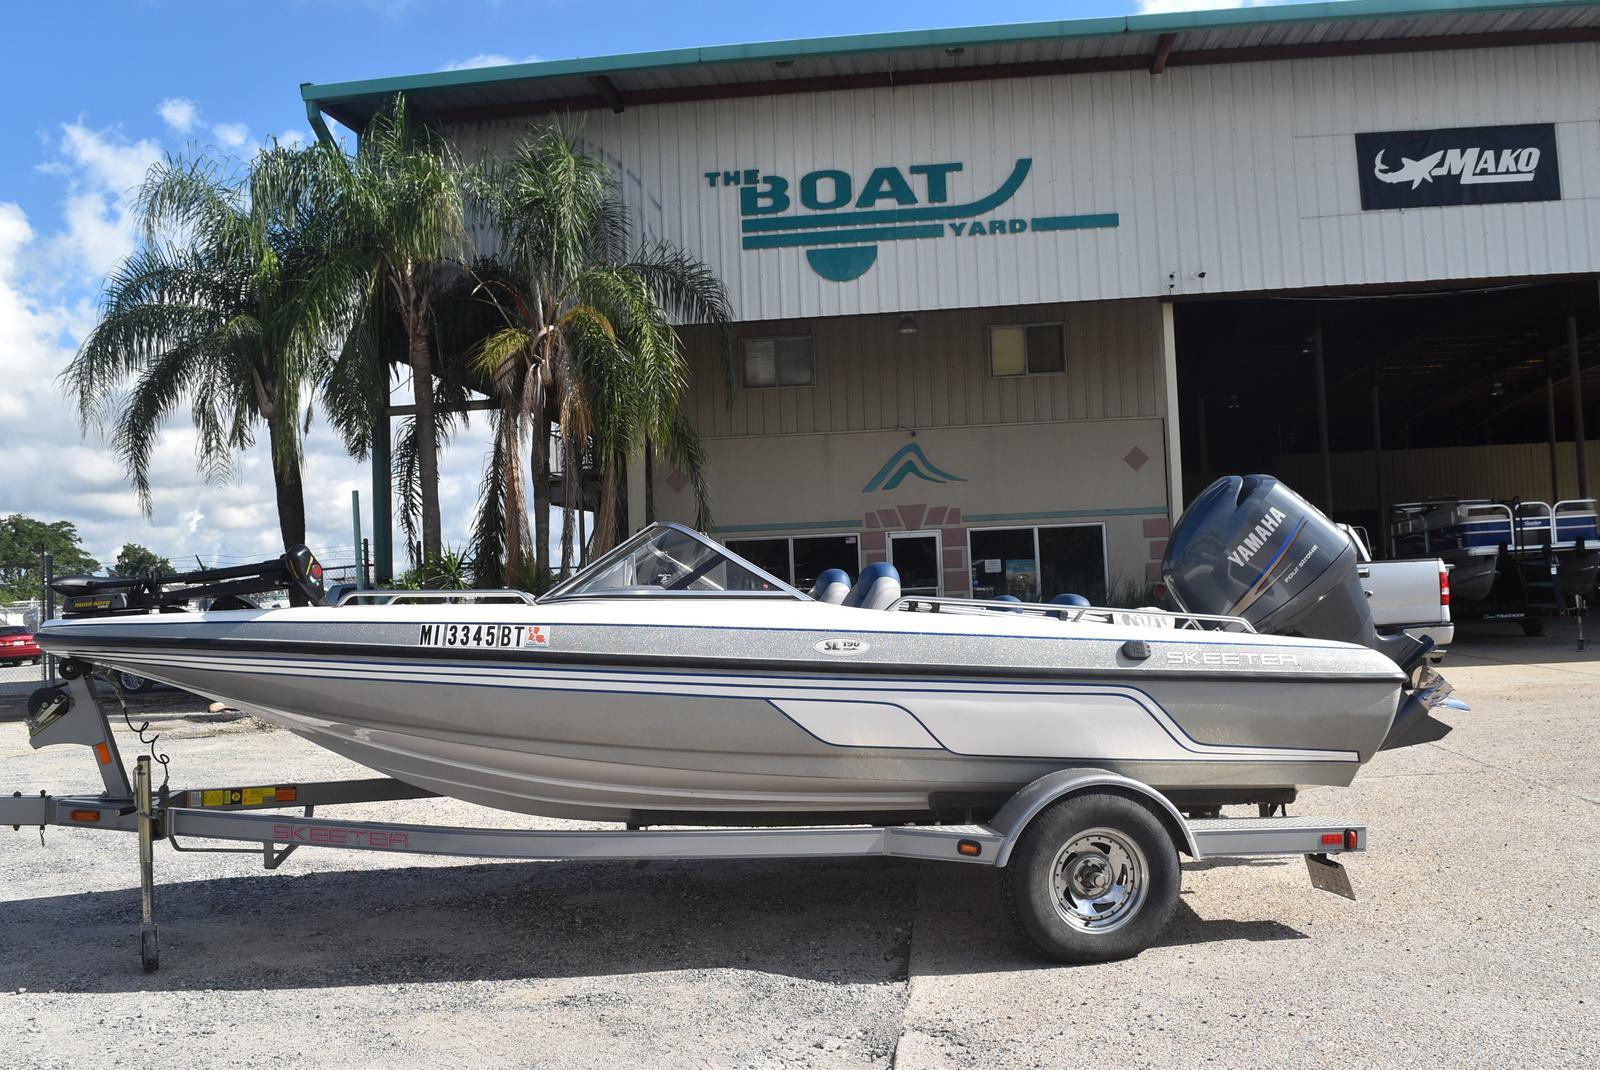 skeeter bass boat for sale - HD1600×1070